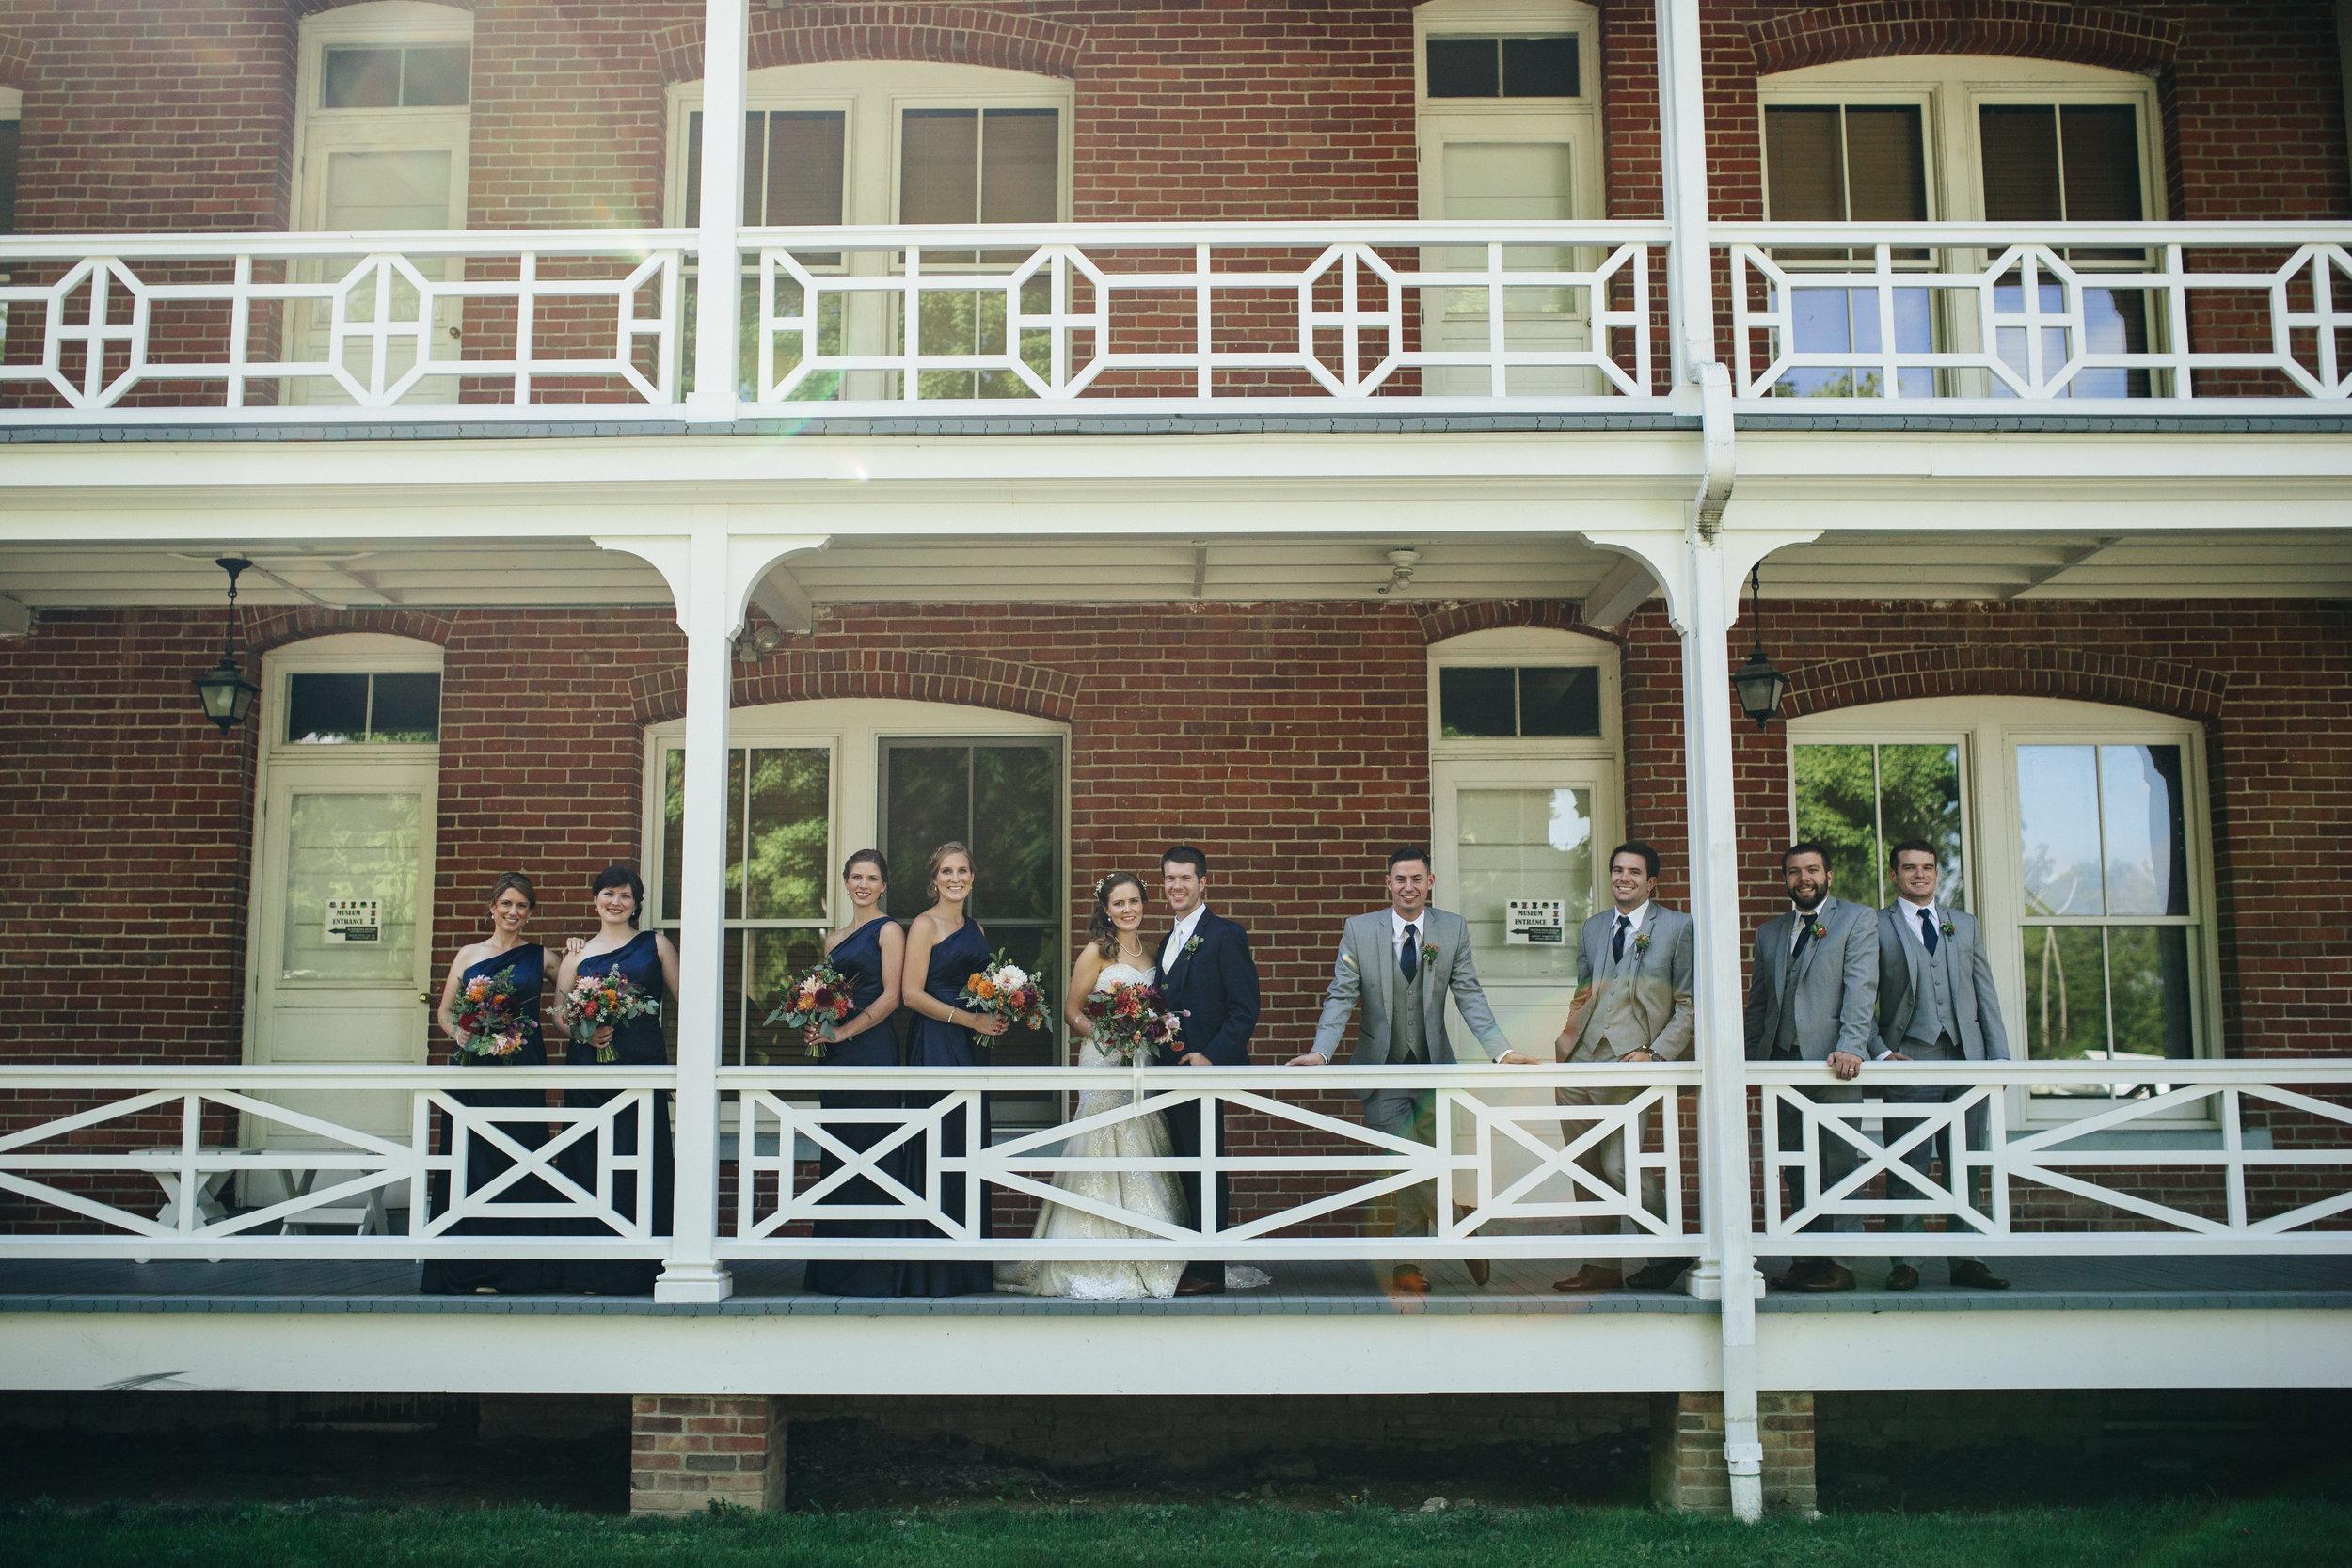 Wedding photography at Wood County Historical Society.